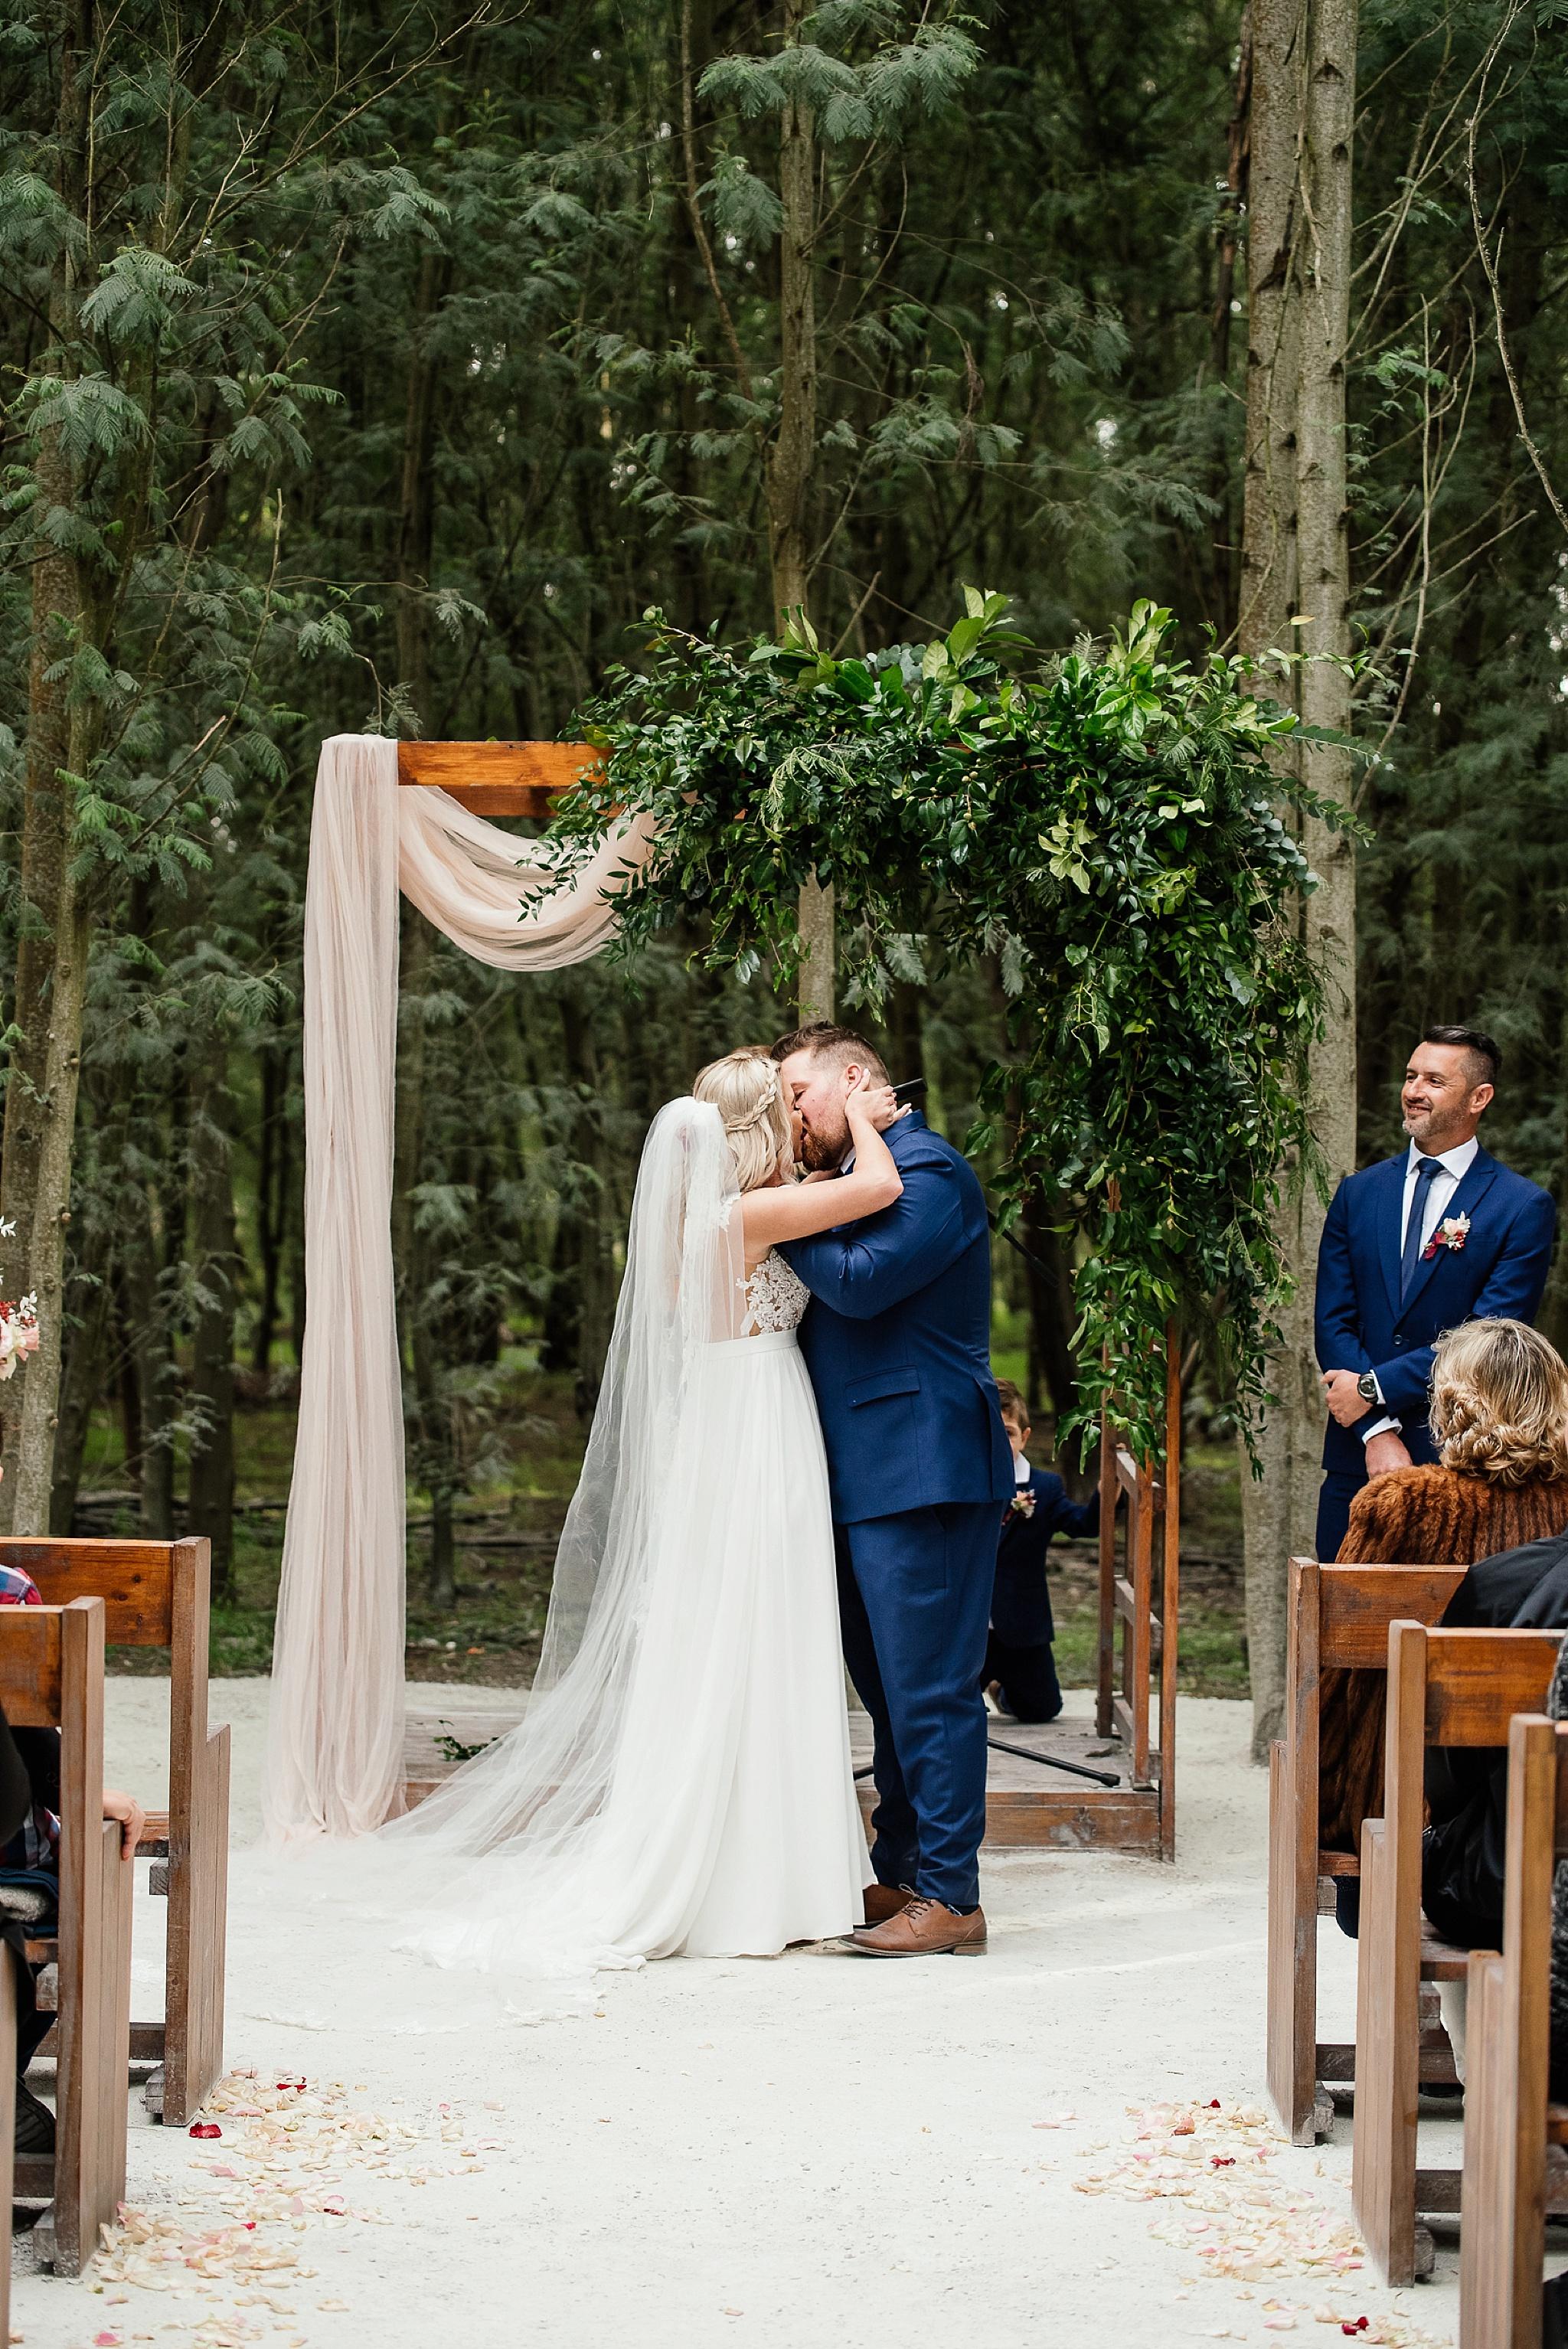 Cape Town Photographer Darren Bester - Die Woud Wedding - Gareth & Roxanne_0023.jpg